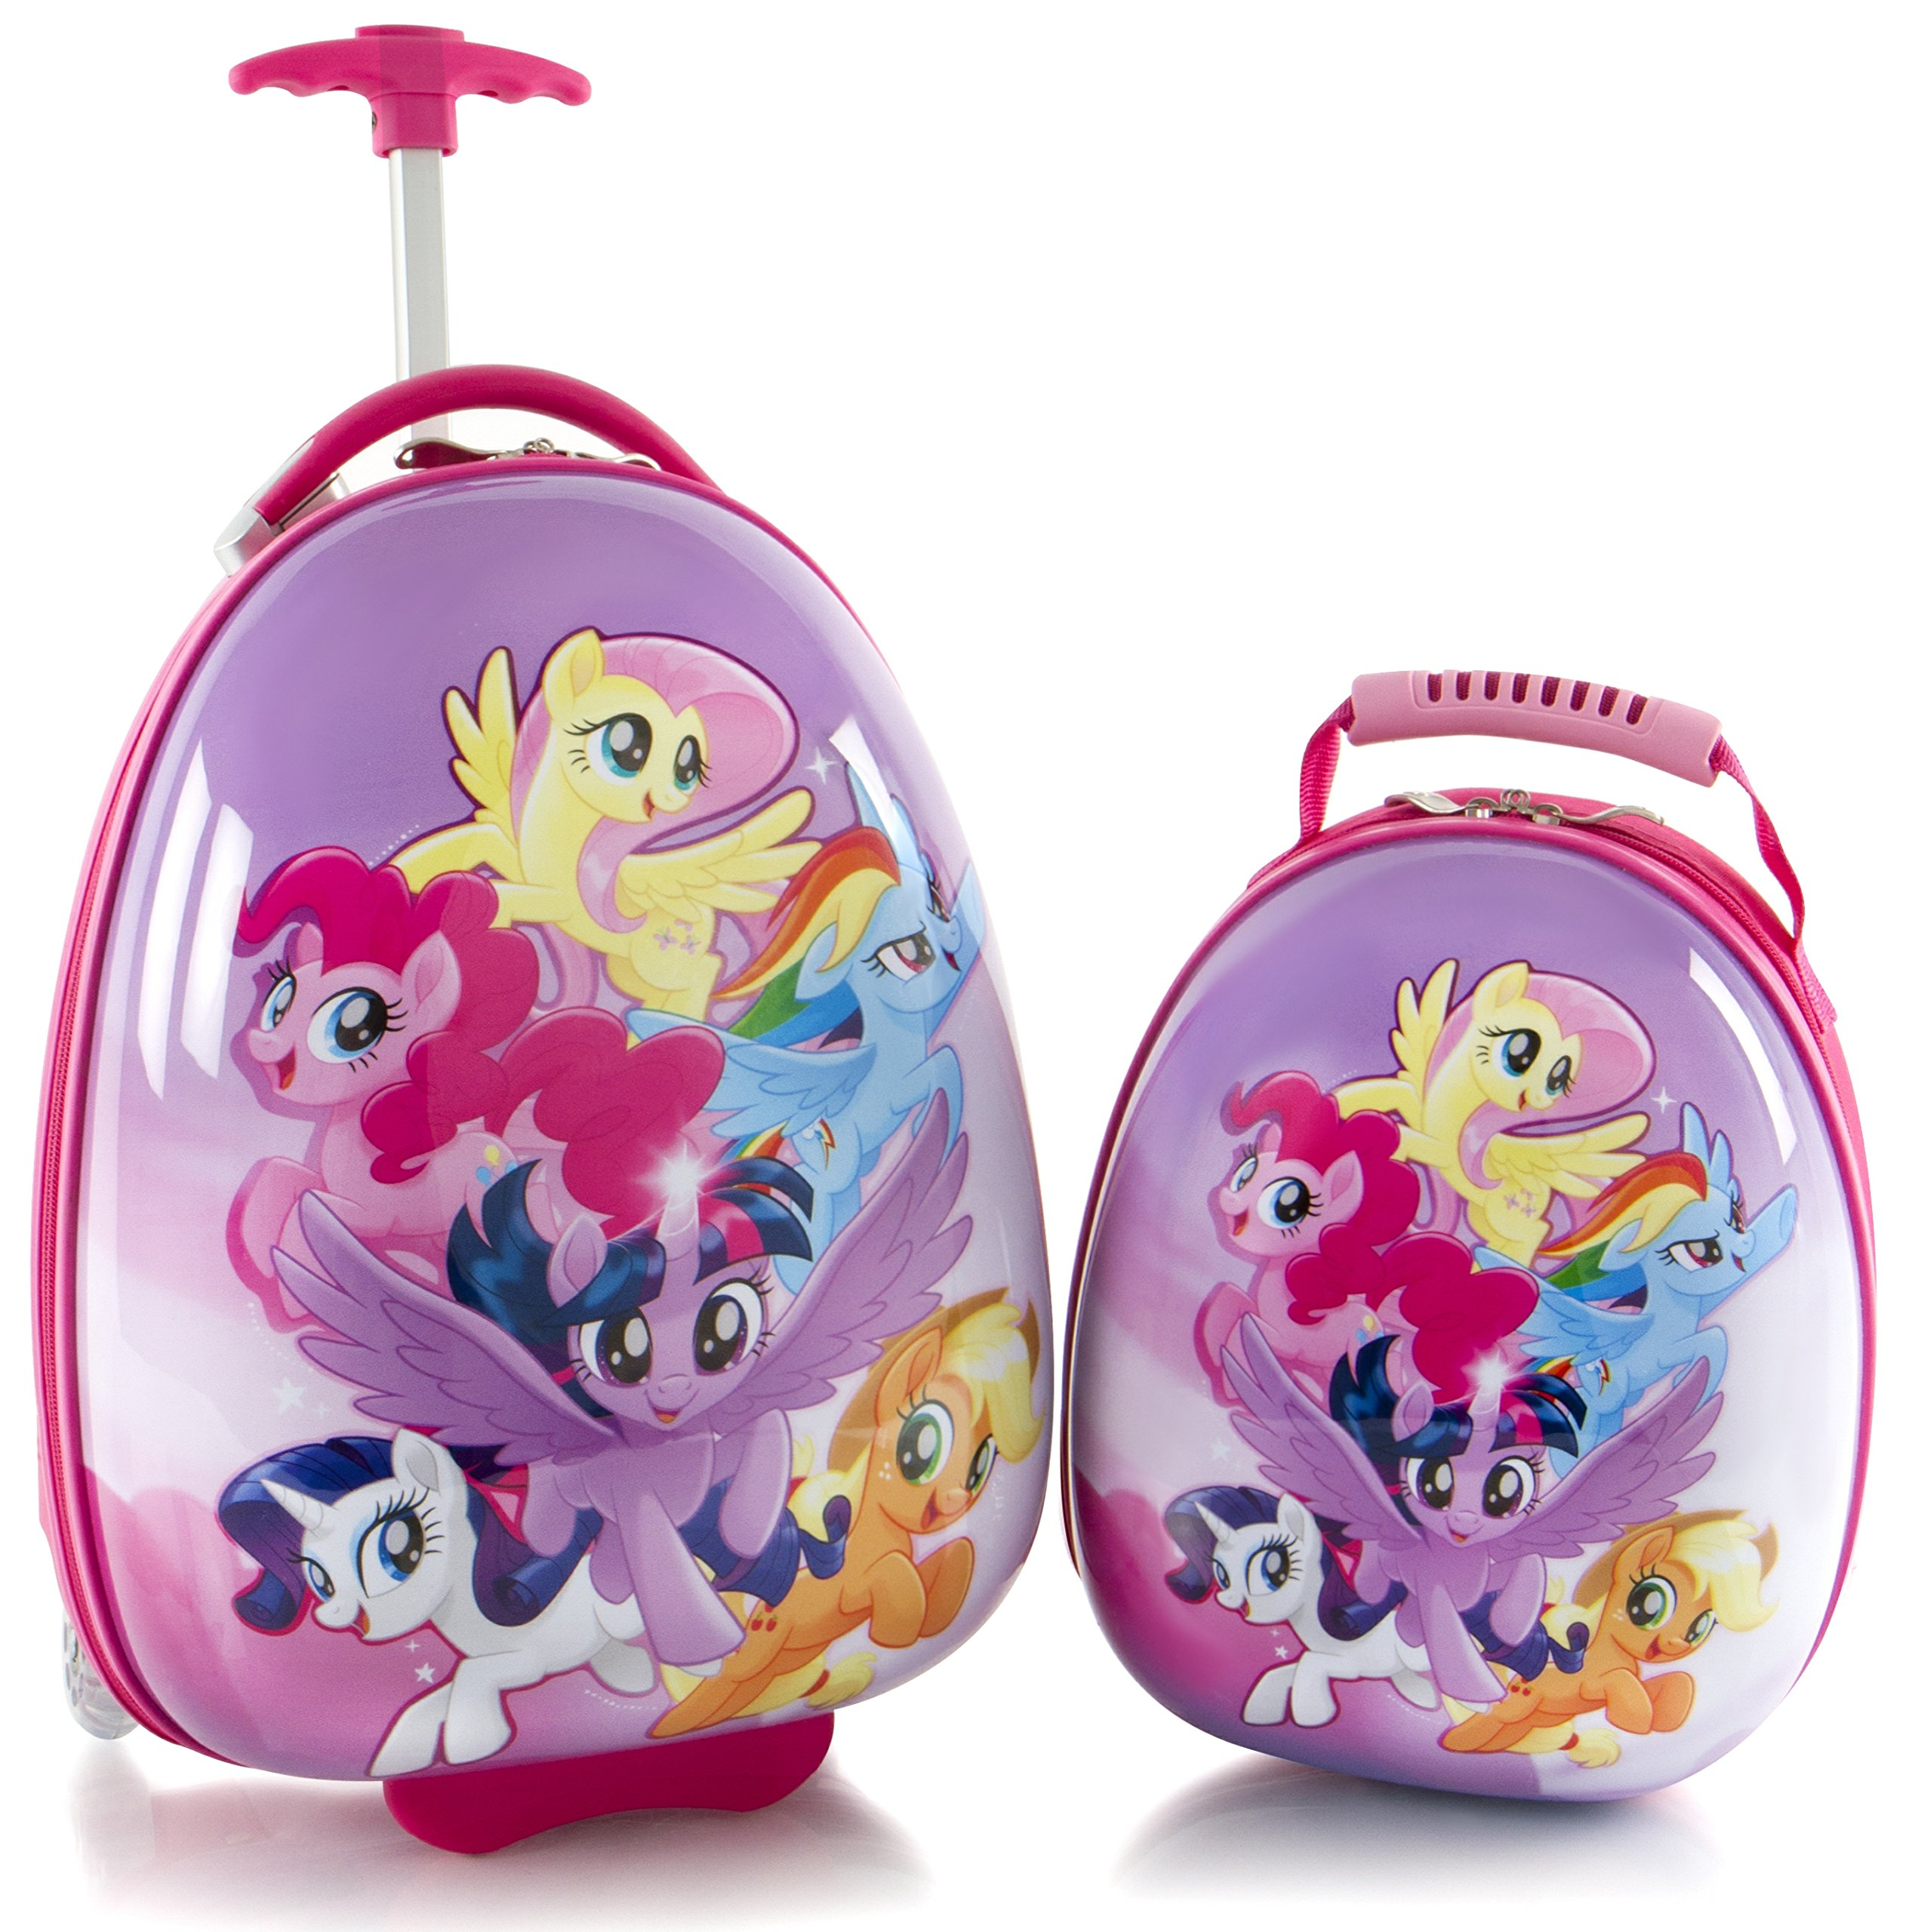 Heys America My Little Pony Kids 2 Pc Luggage Set -18'' Carry On Luggage & 12'' Backpack